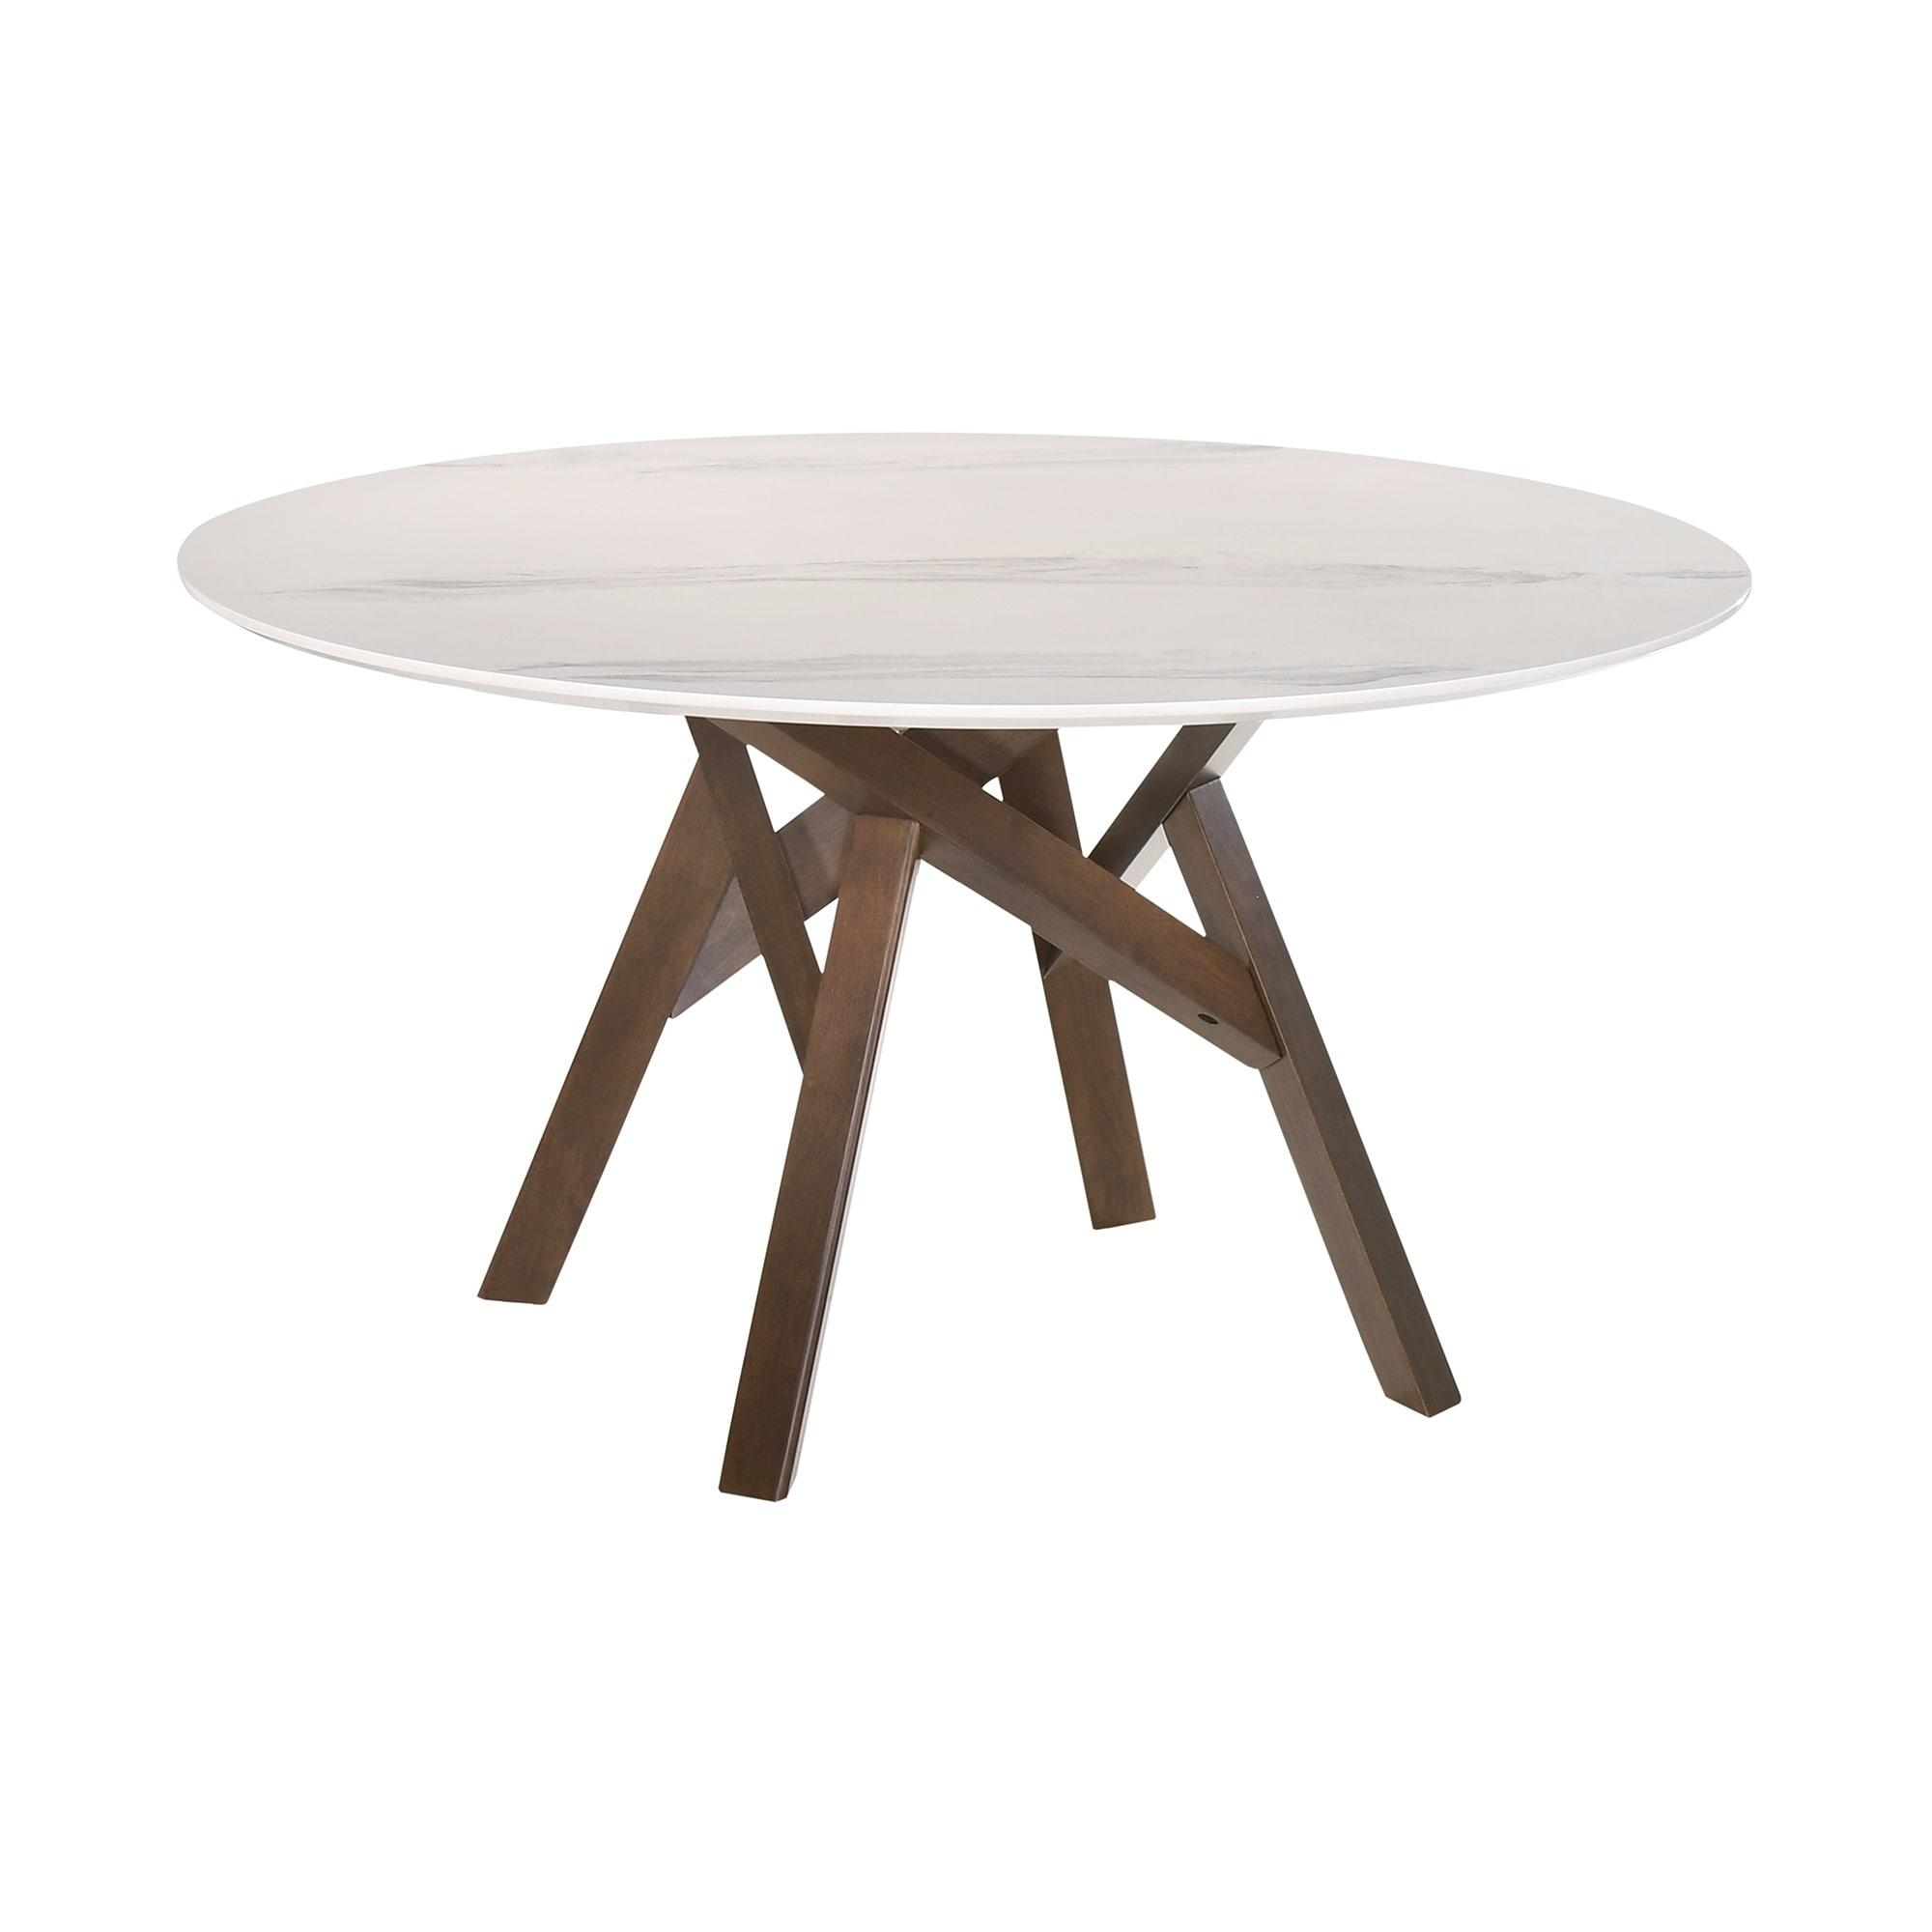 Venus 54 Round Mid Century Modern Pedestal Dining Table On Sale Overstock 30716976